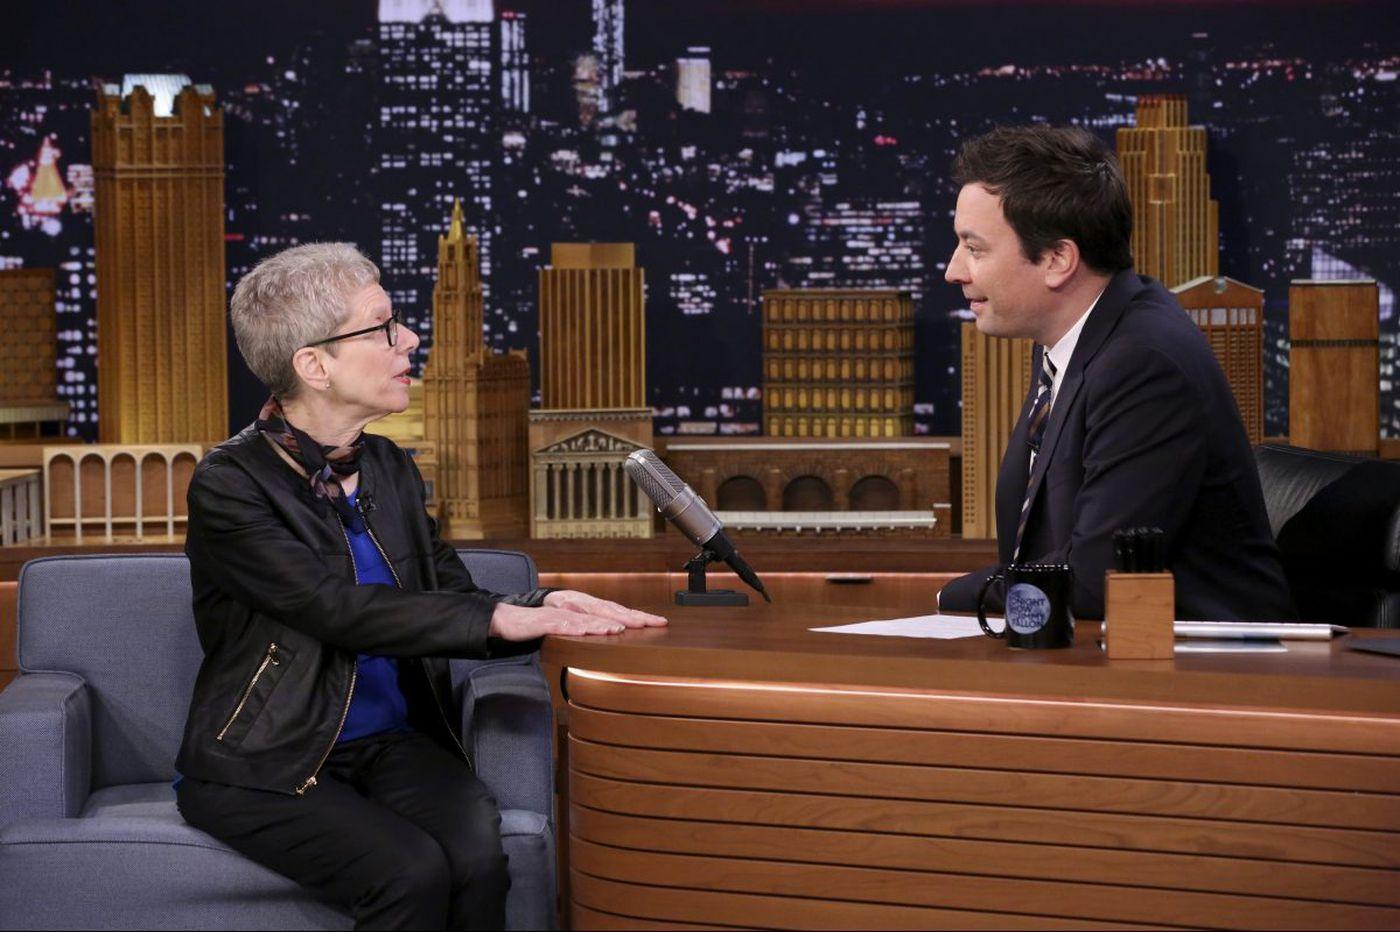 Terry Gross talks about meeting her future husband at a Penn record shop, burns Bill O'Reilly on 'Fallon'